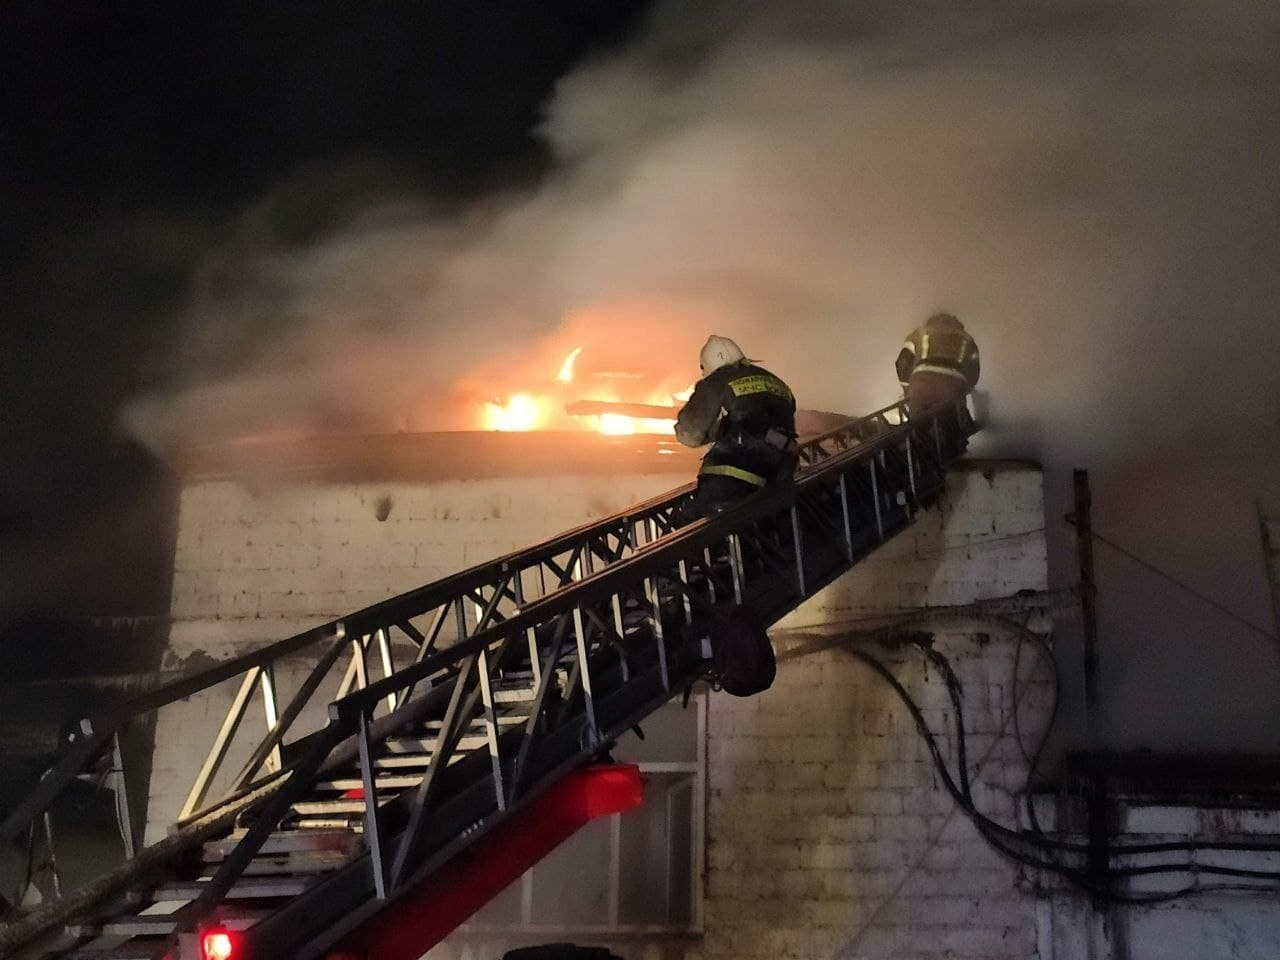 Огонь охватил крышу постройки